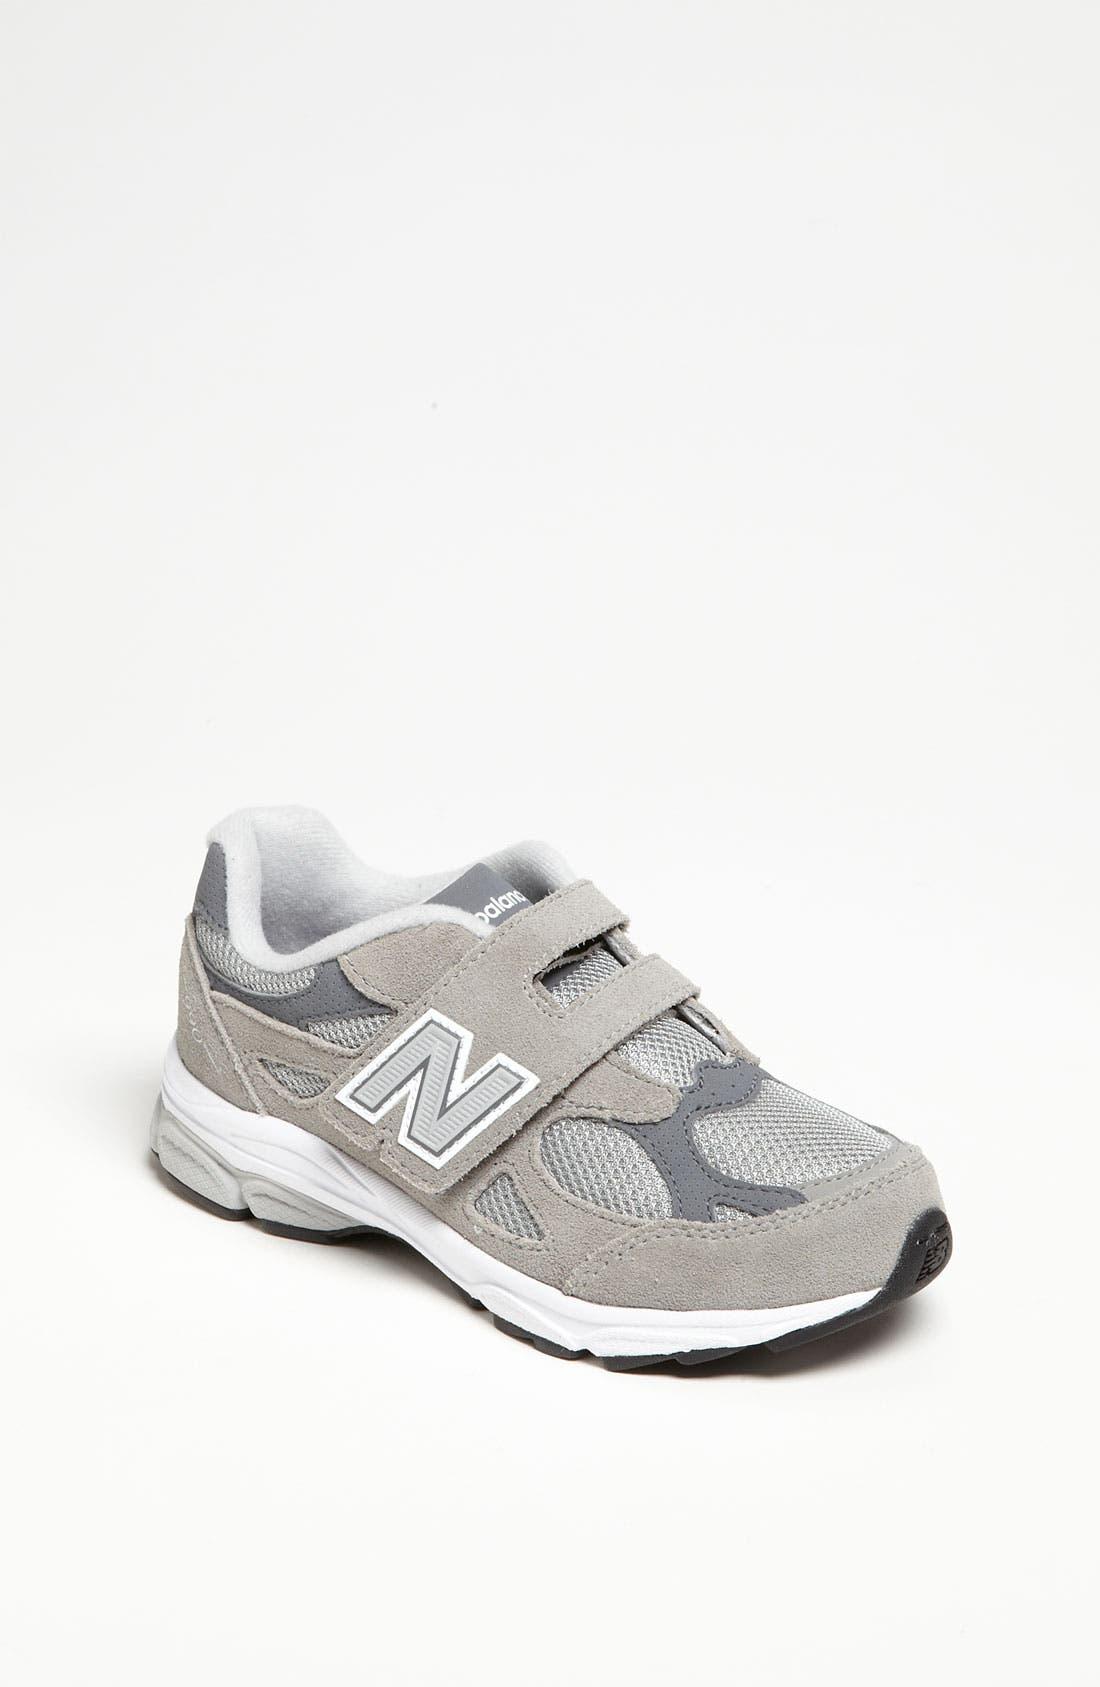 Main Image - New Balance '990' Sneaker (Baby, Walker, Toddler & Little Kid)